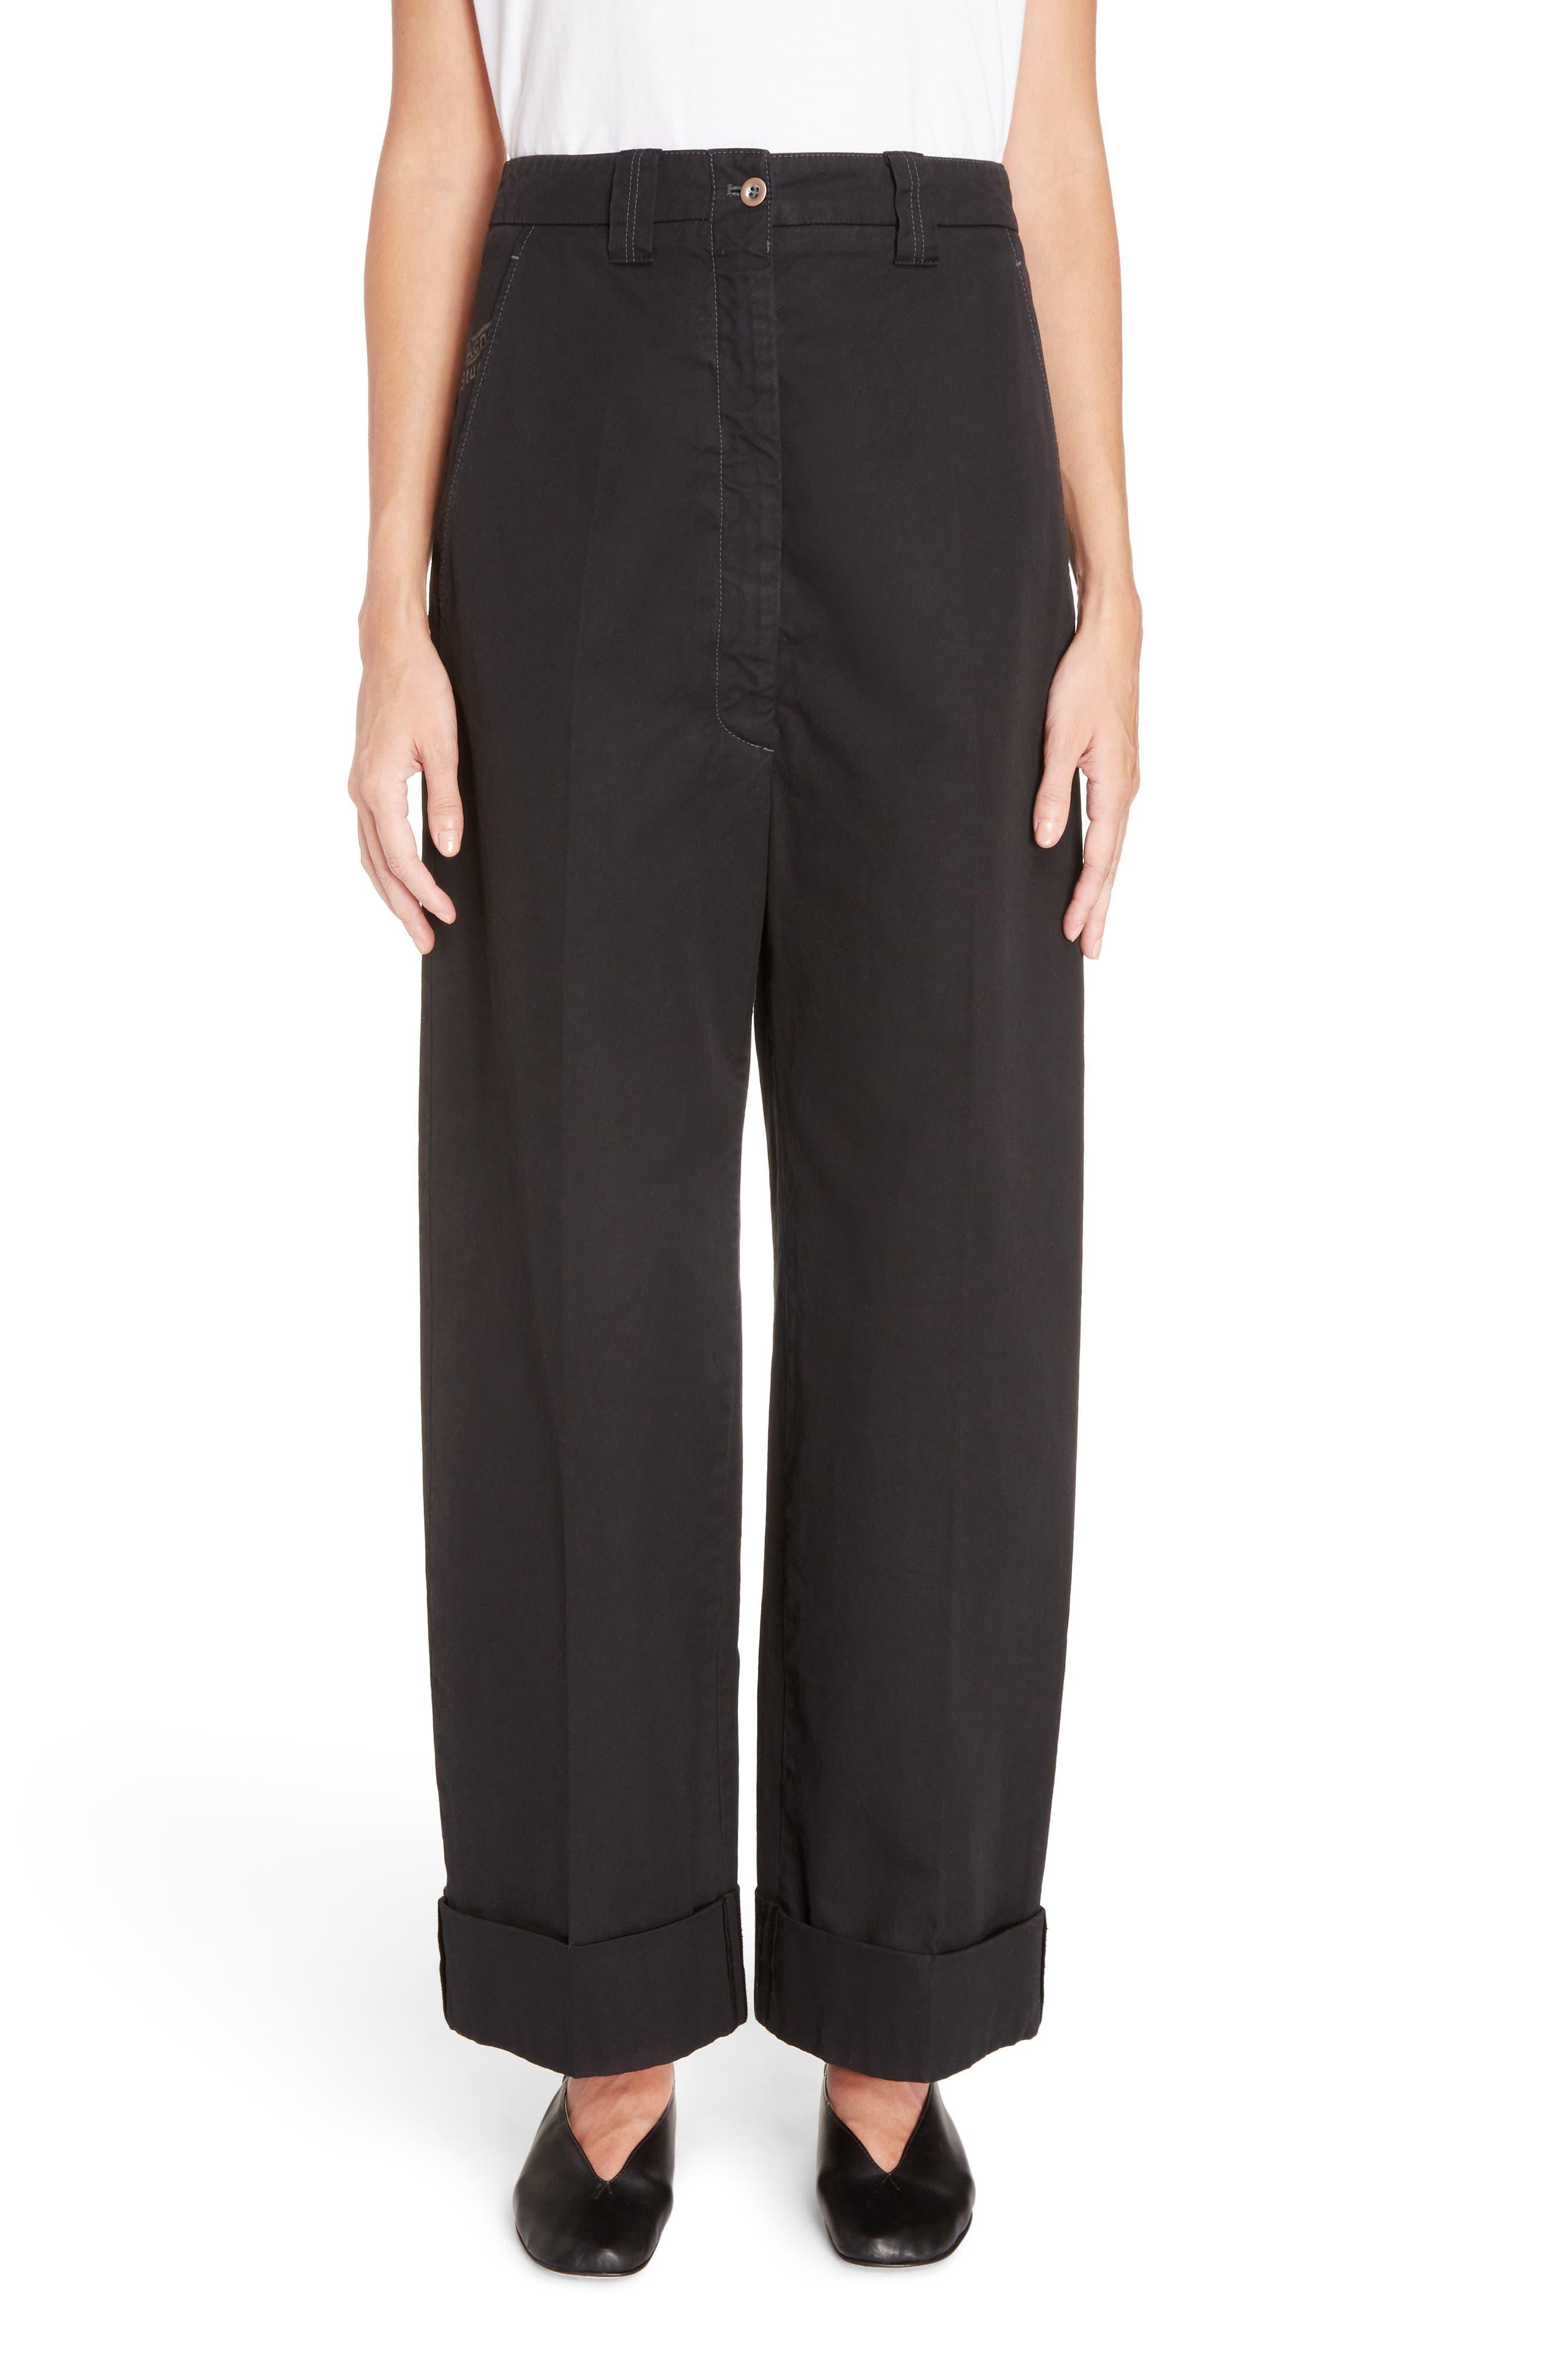 Madya Cuffed Cotton Pants,                             Main thumbnail 1, color,                             Black